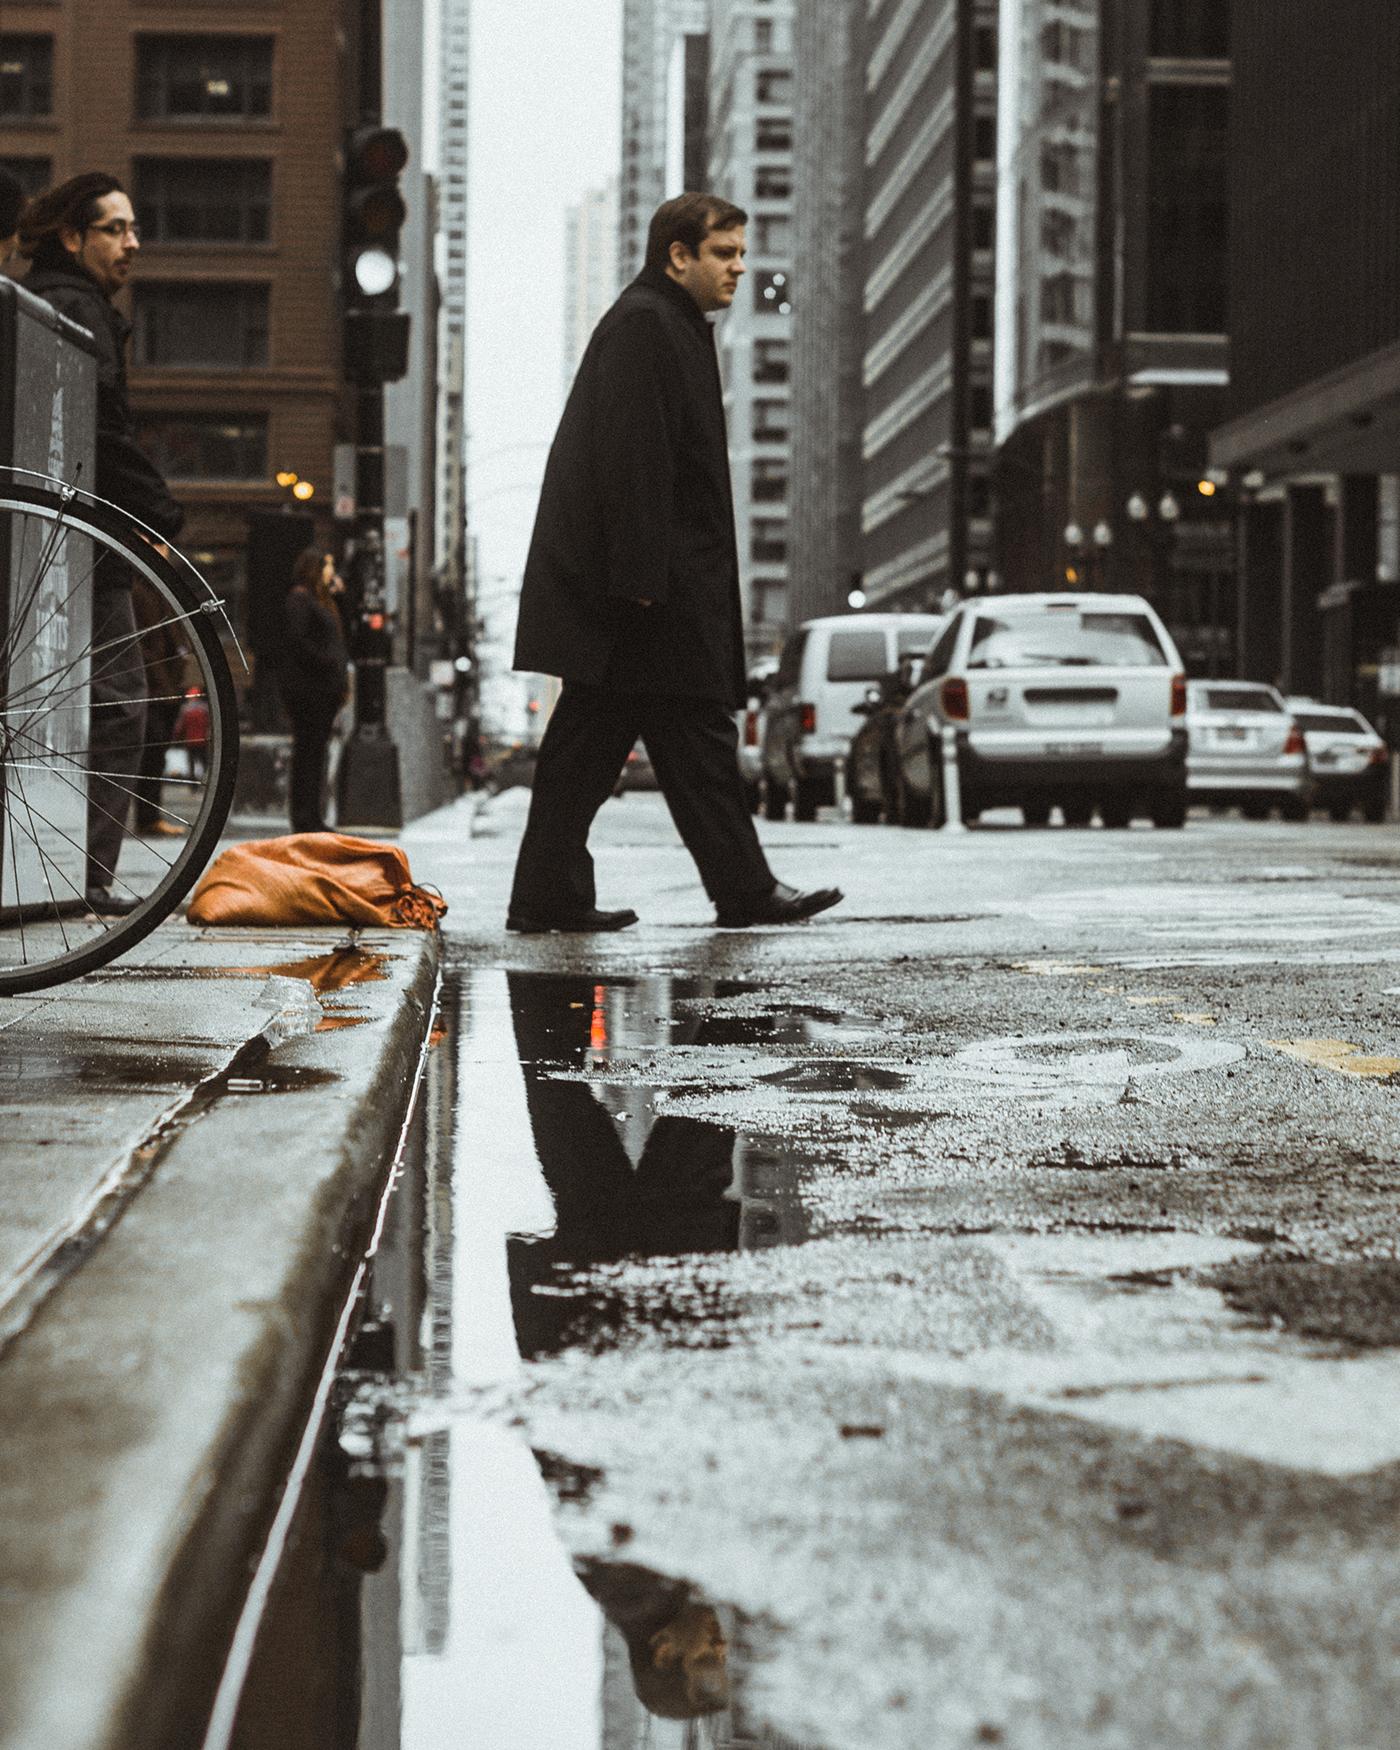 Street Photography On Behance